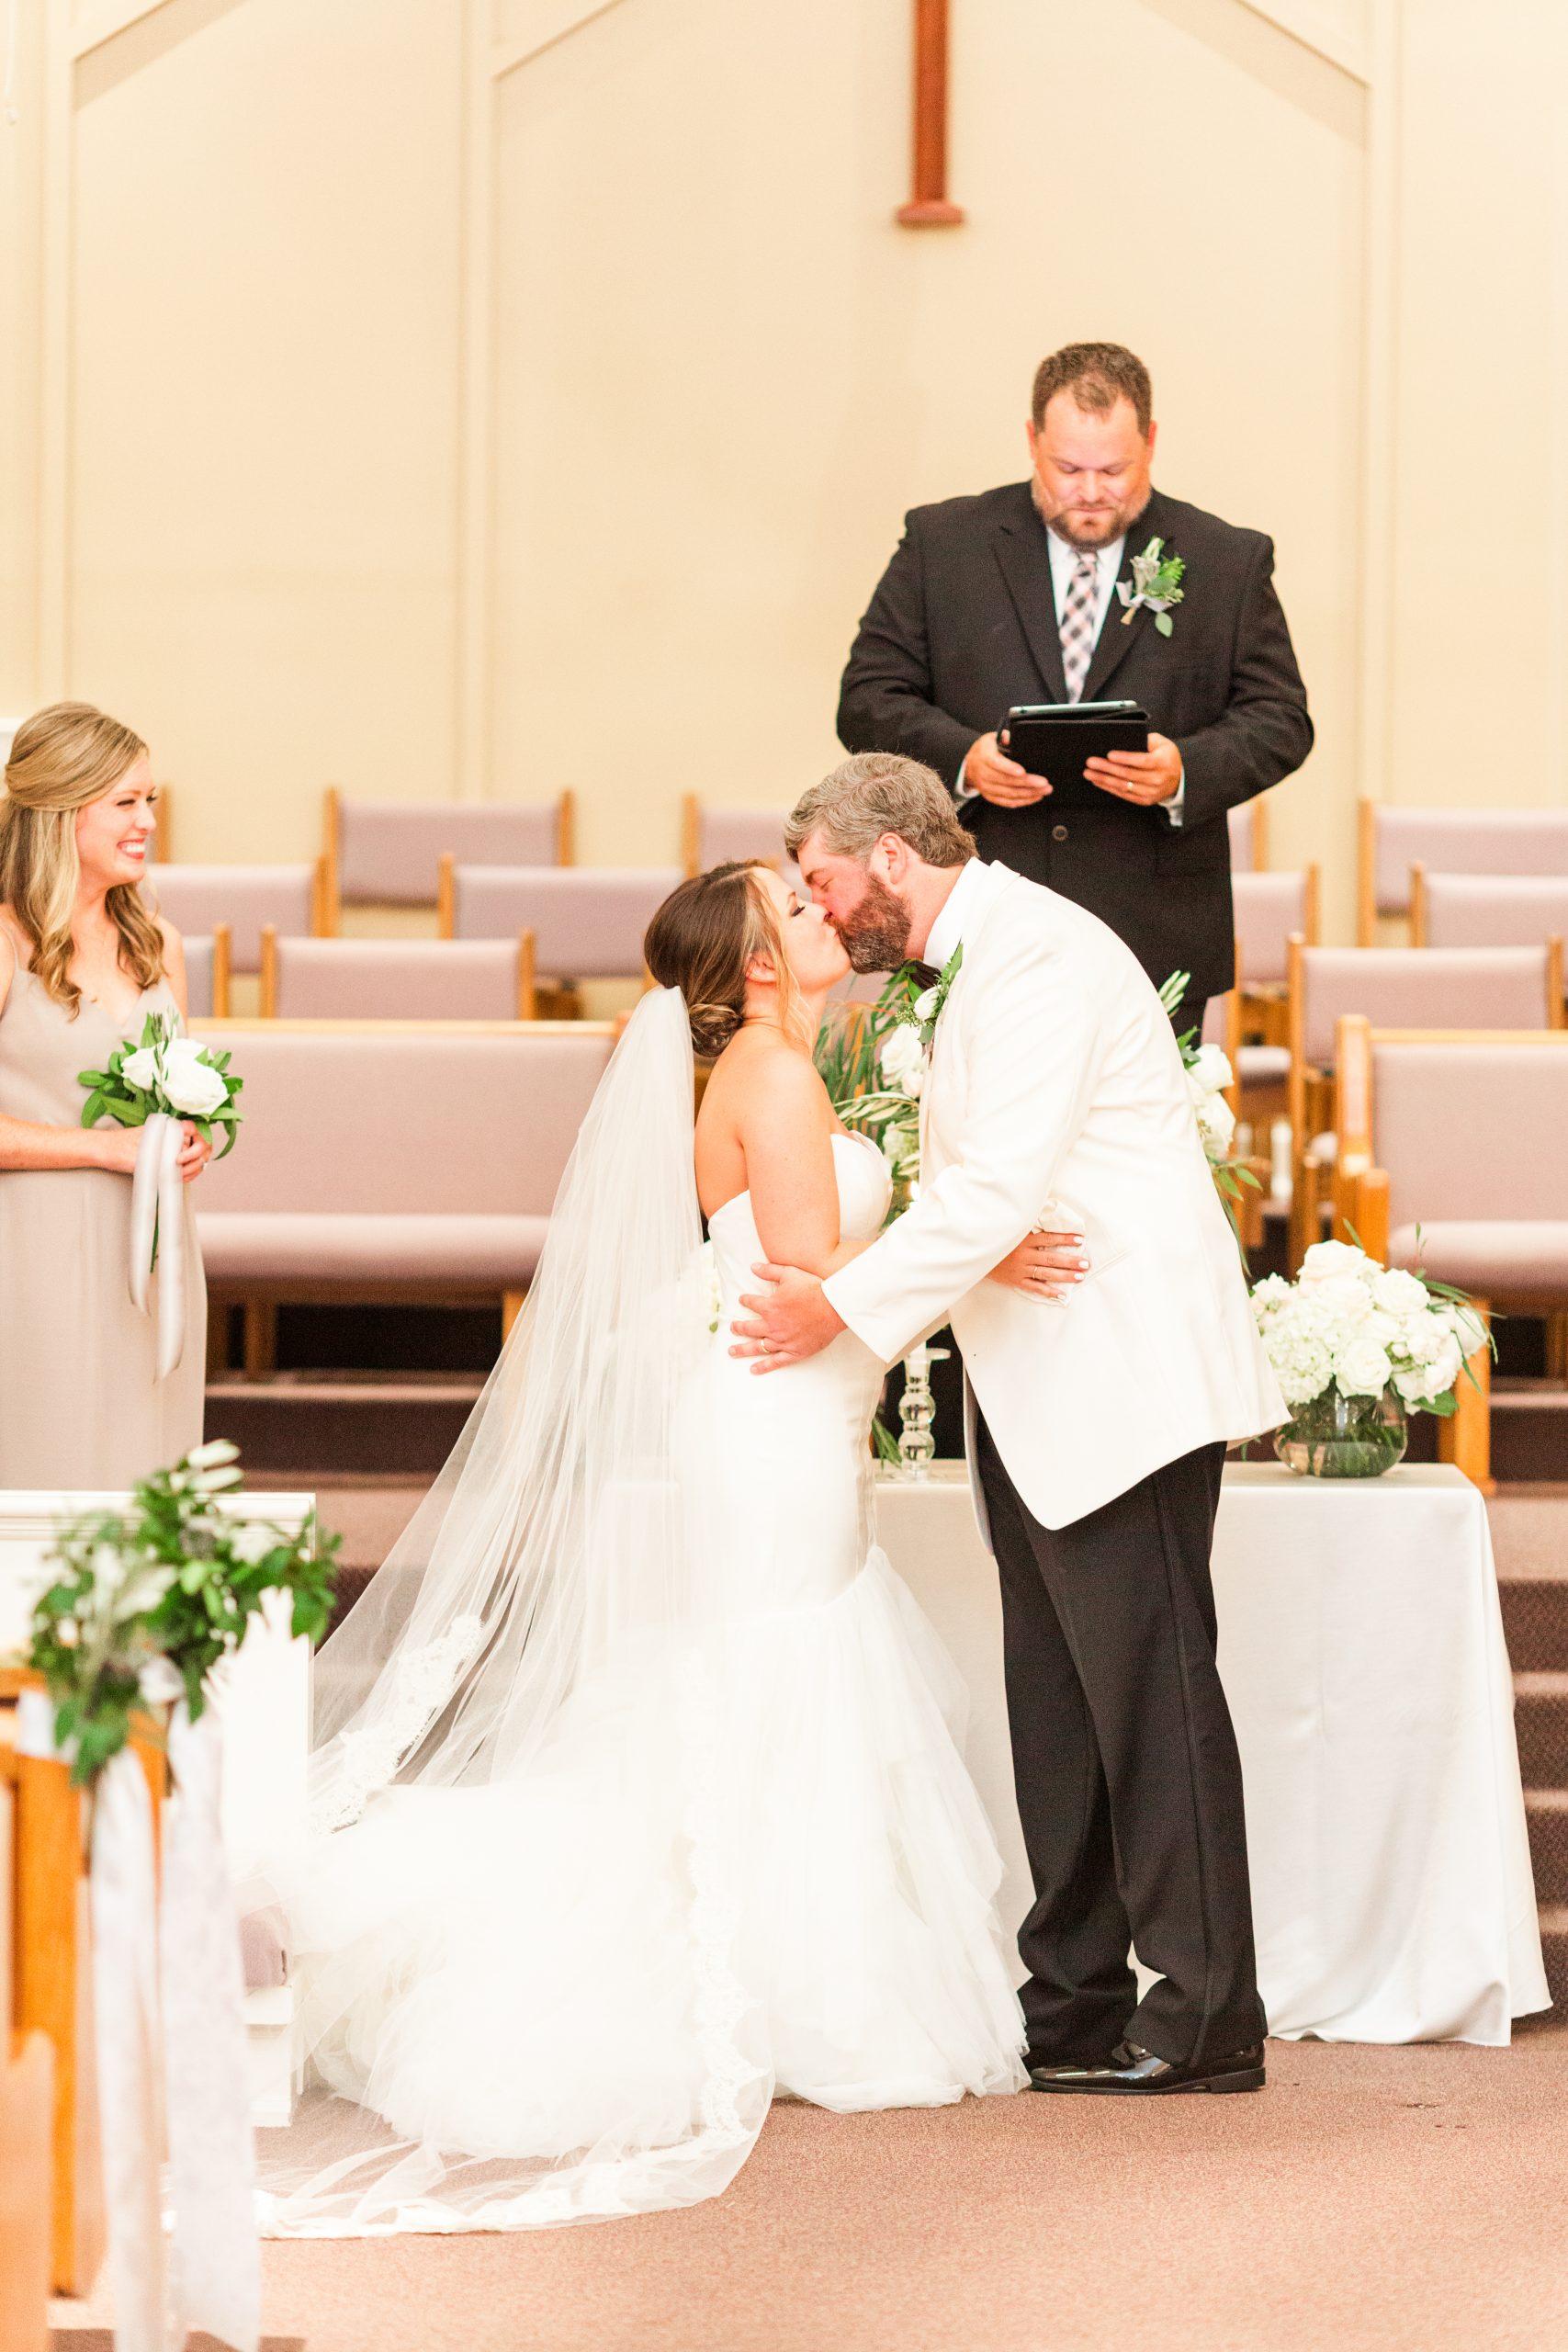 Alabama couple kisses during church wedding ceremony